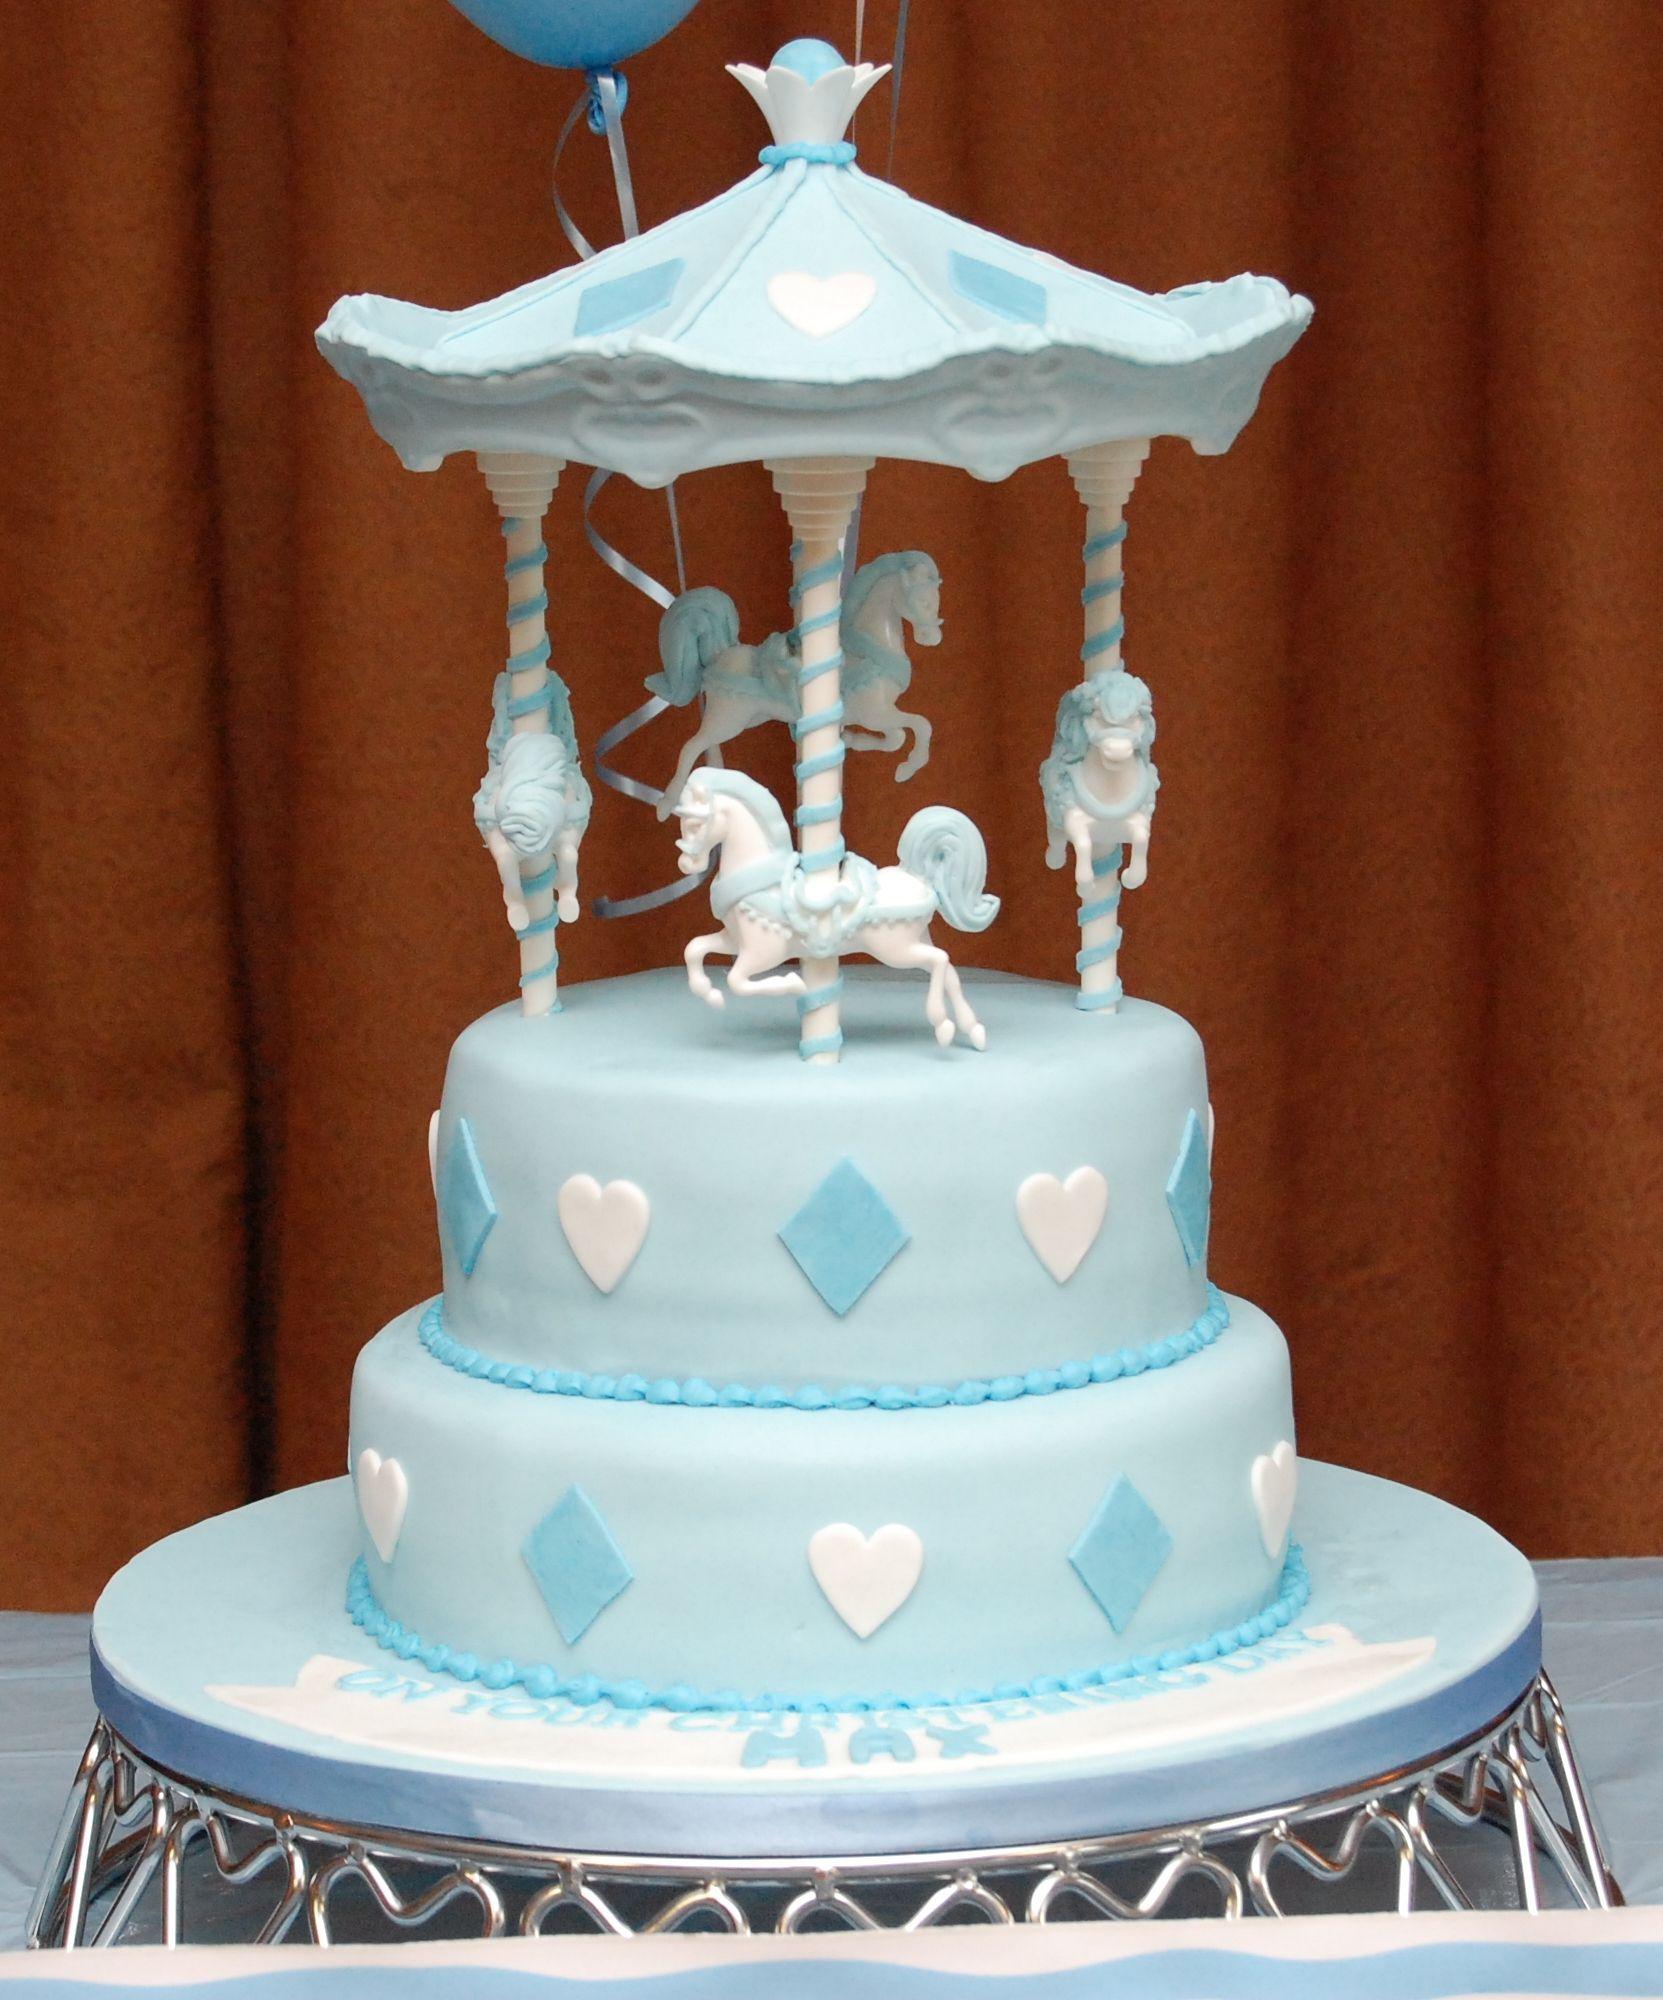 Wilton Carousel Cake Kit - Google Search